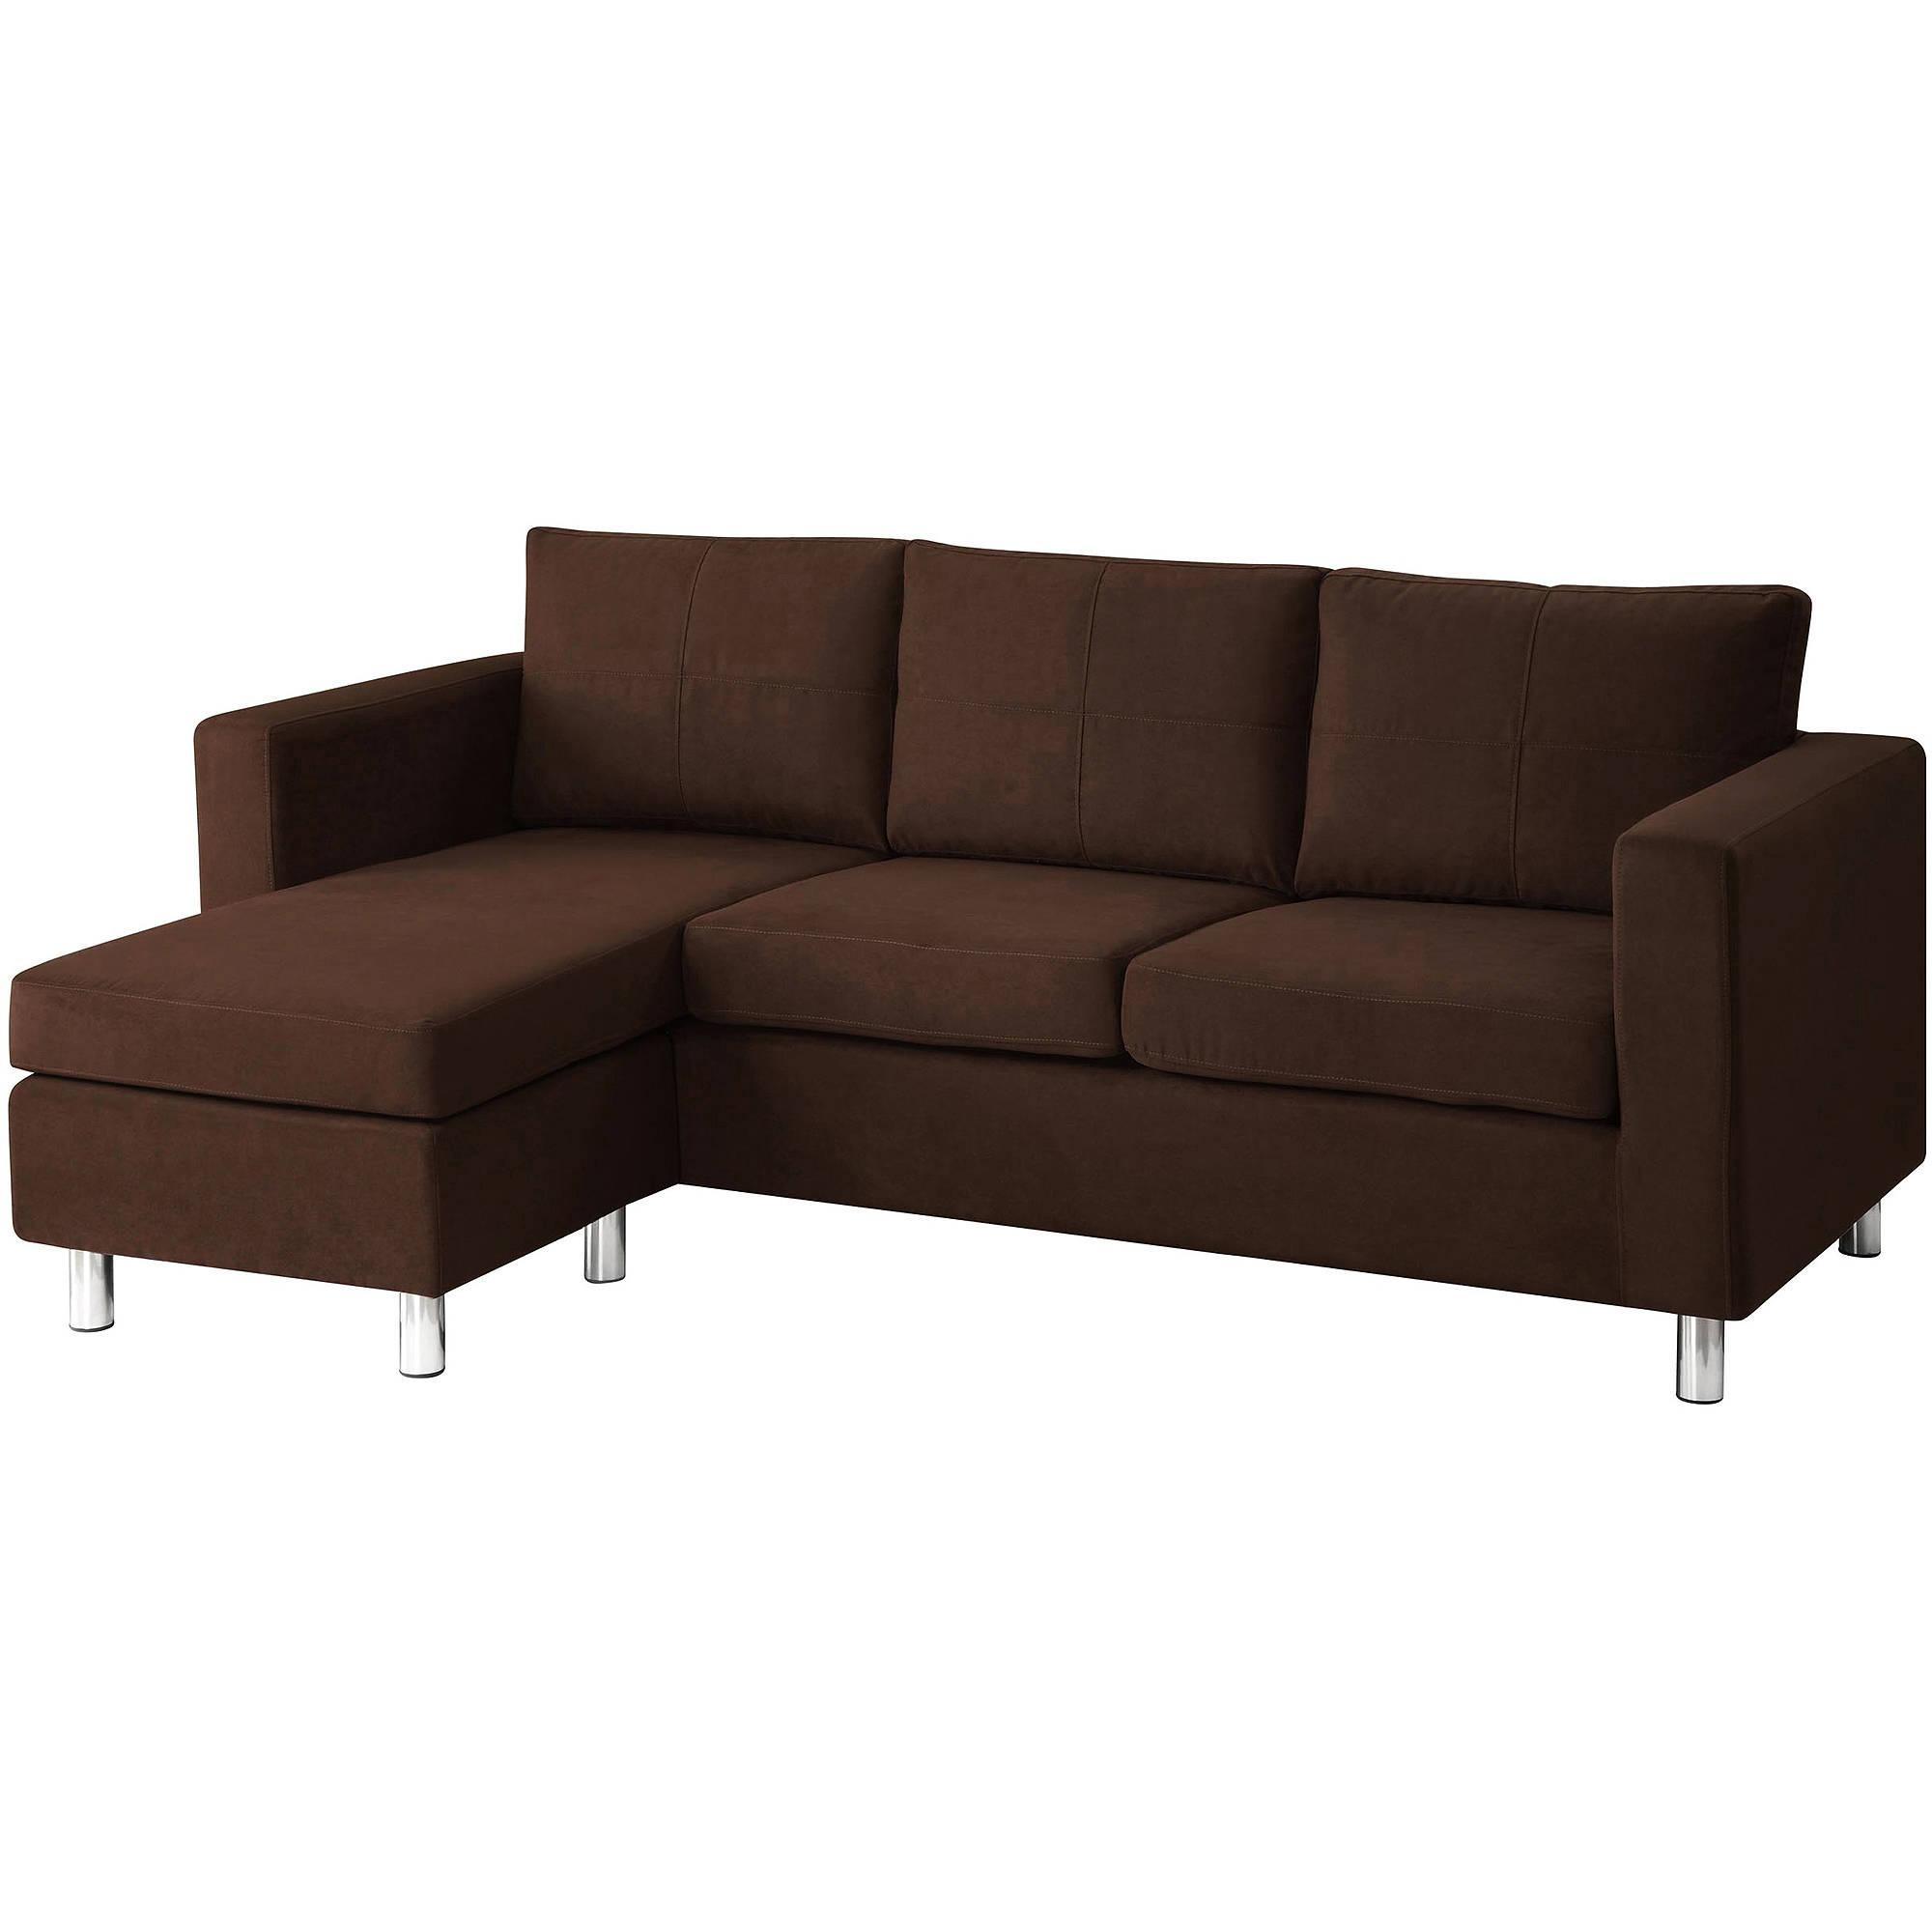 20 inspirations sofa arm caps sofa ideas for Linen furniture covers